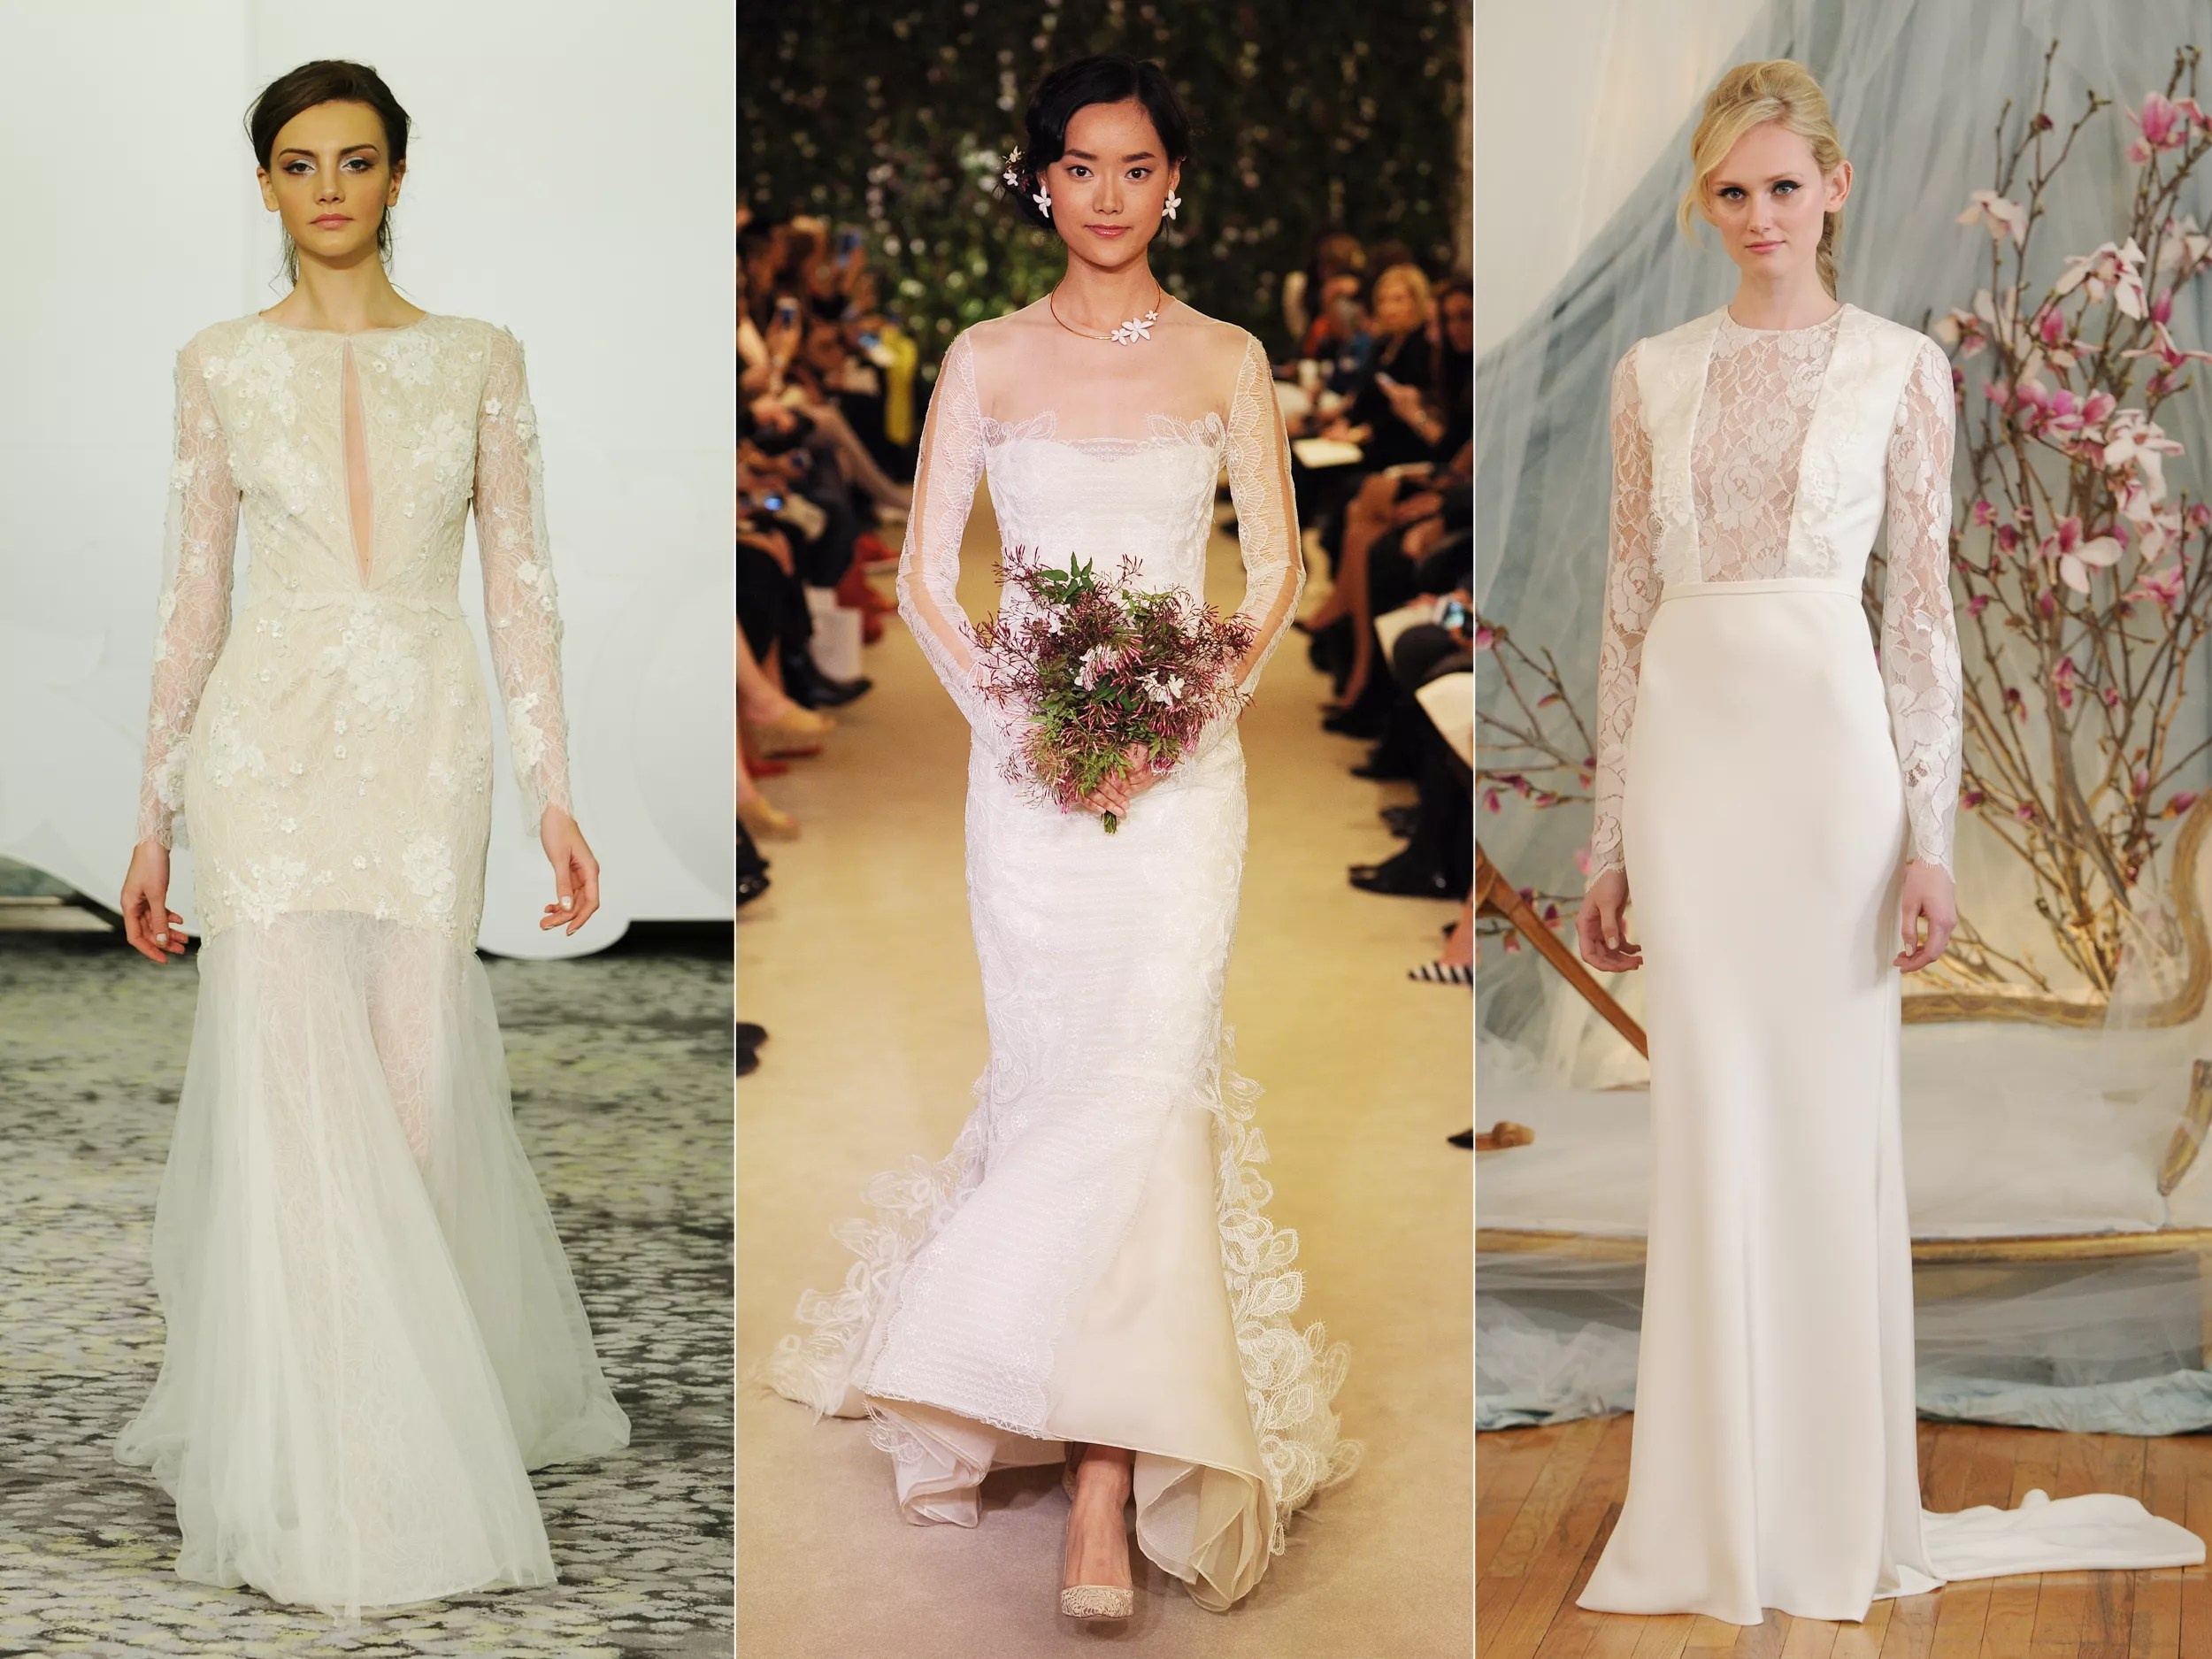 15 Beautiful Long-Sleeved Wedding Dresses